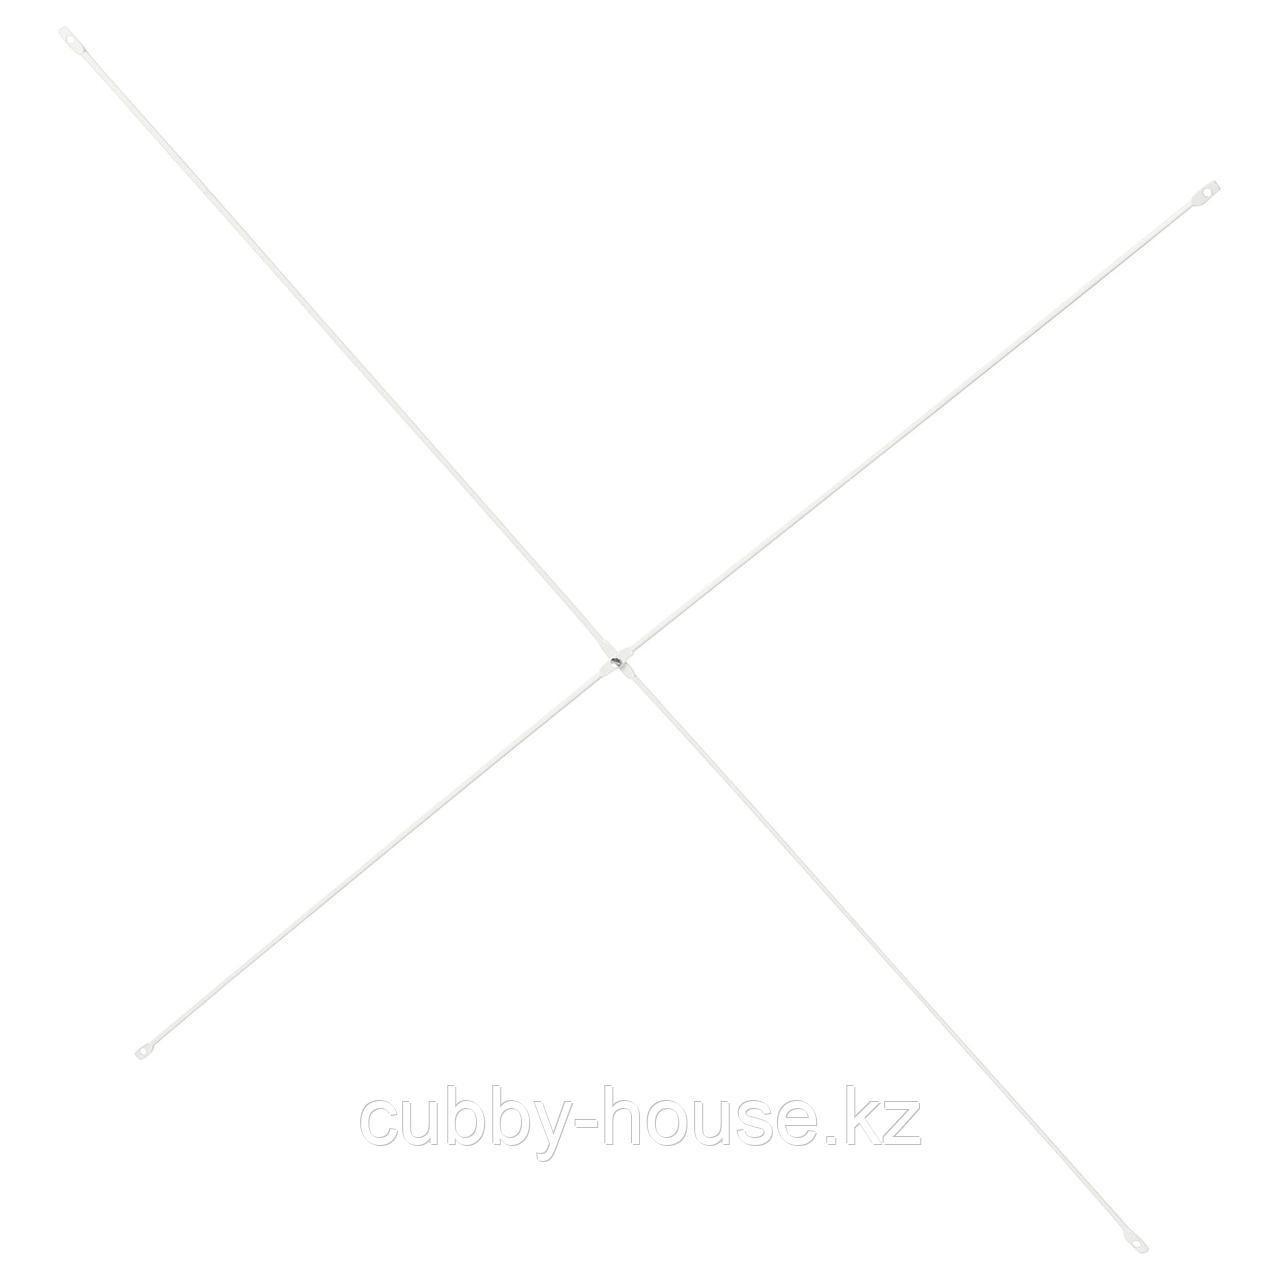 ЭЛВАРЛИ Крестовина, белый, 80 см